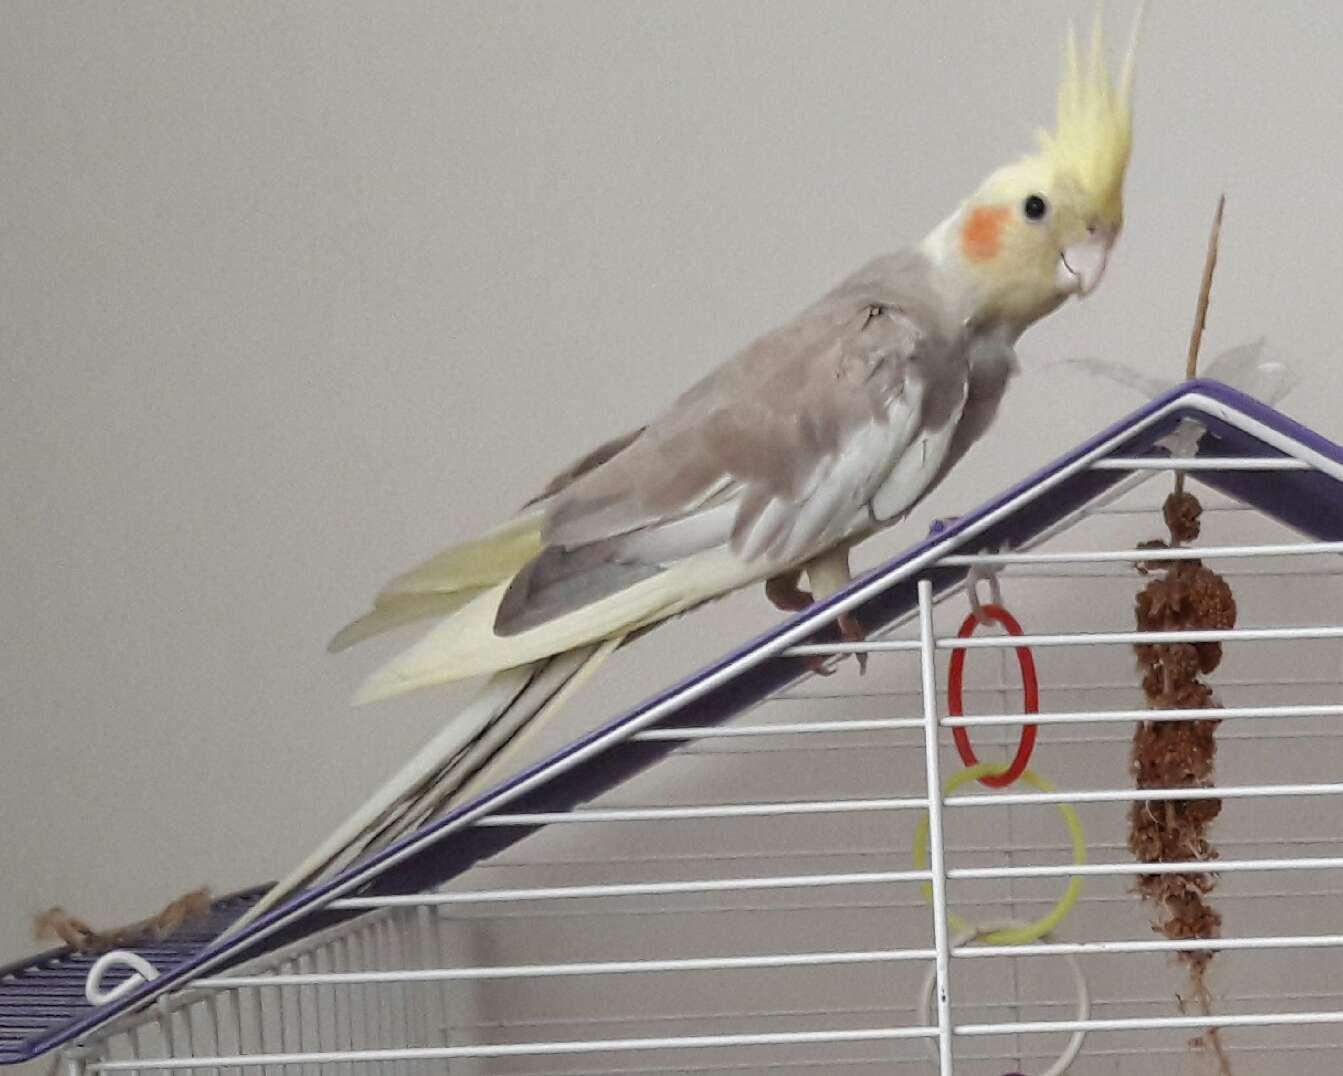 Sultan papağanımız kaybolmuştur!!